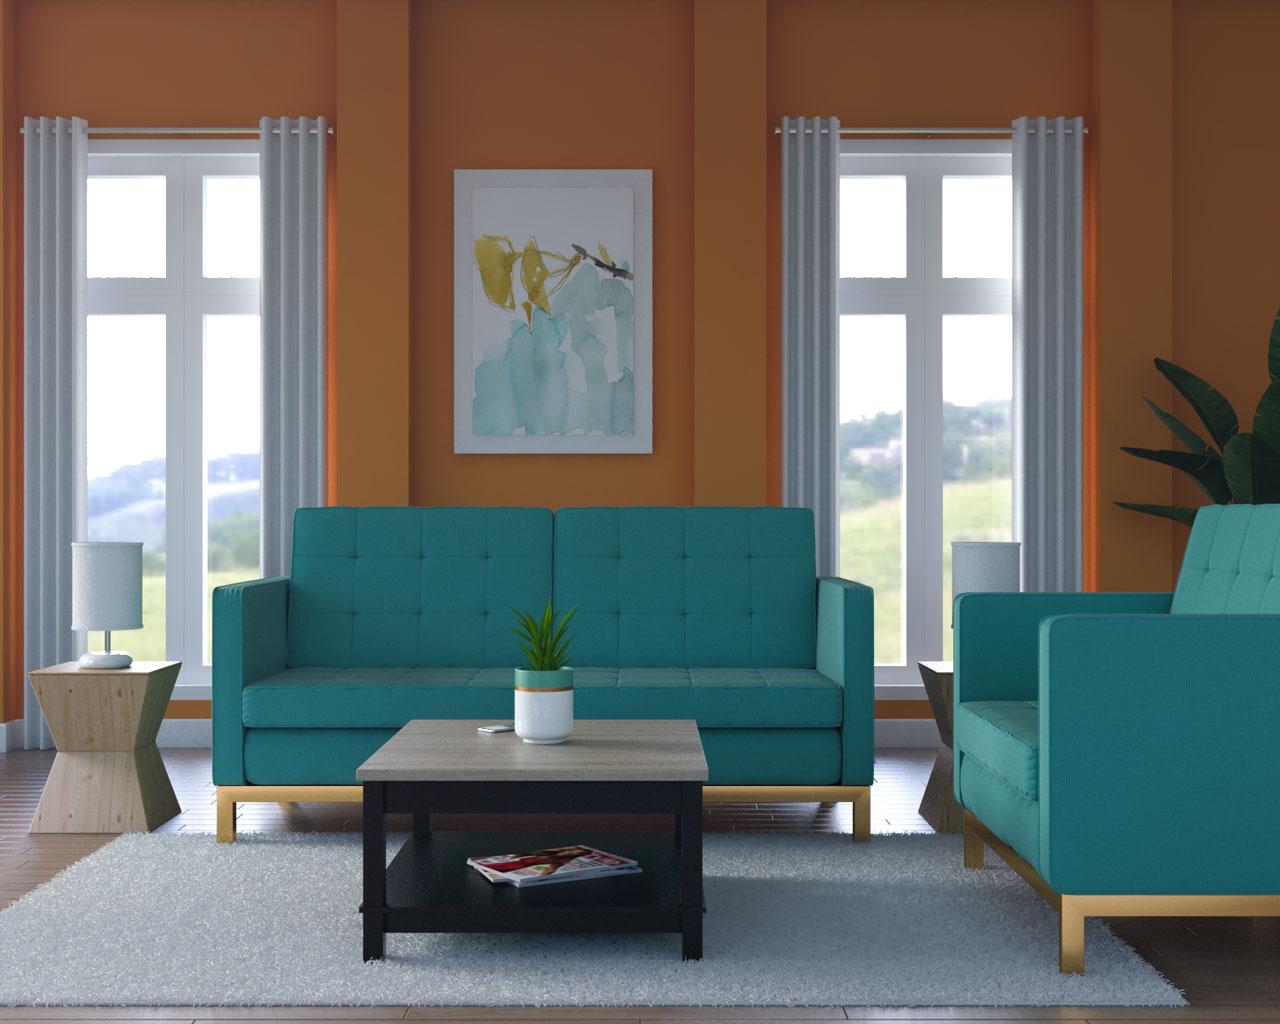 Orange walls with teal furniture